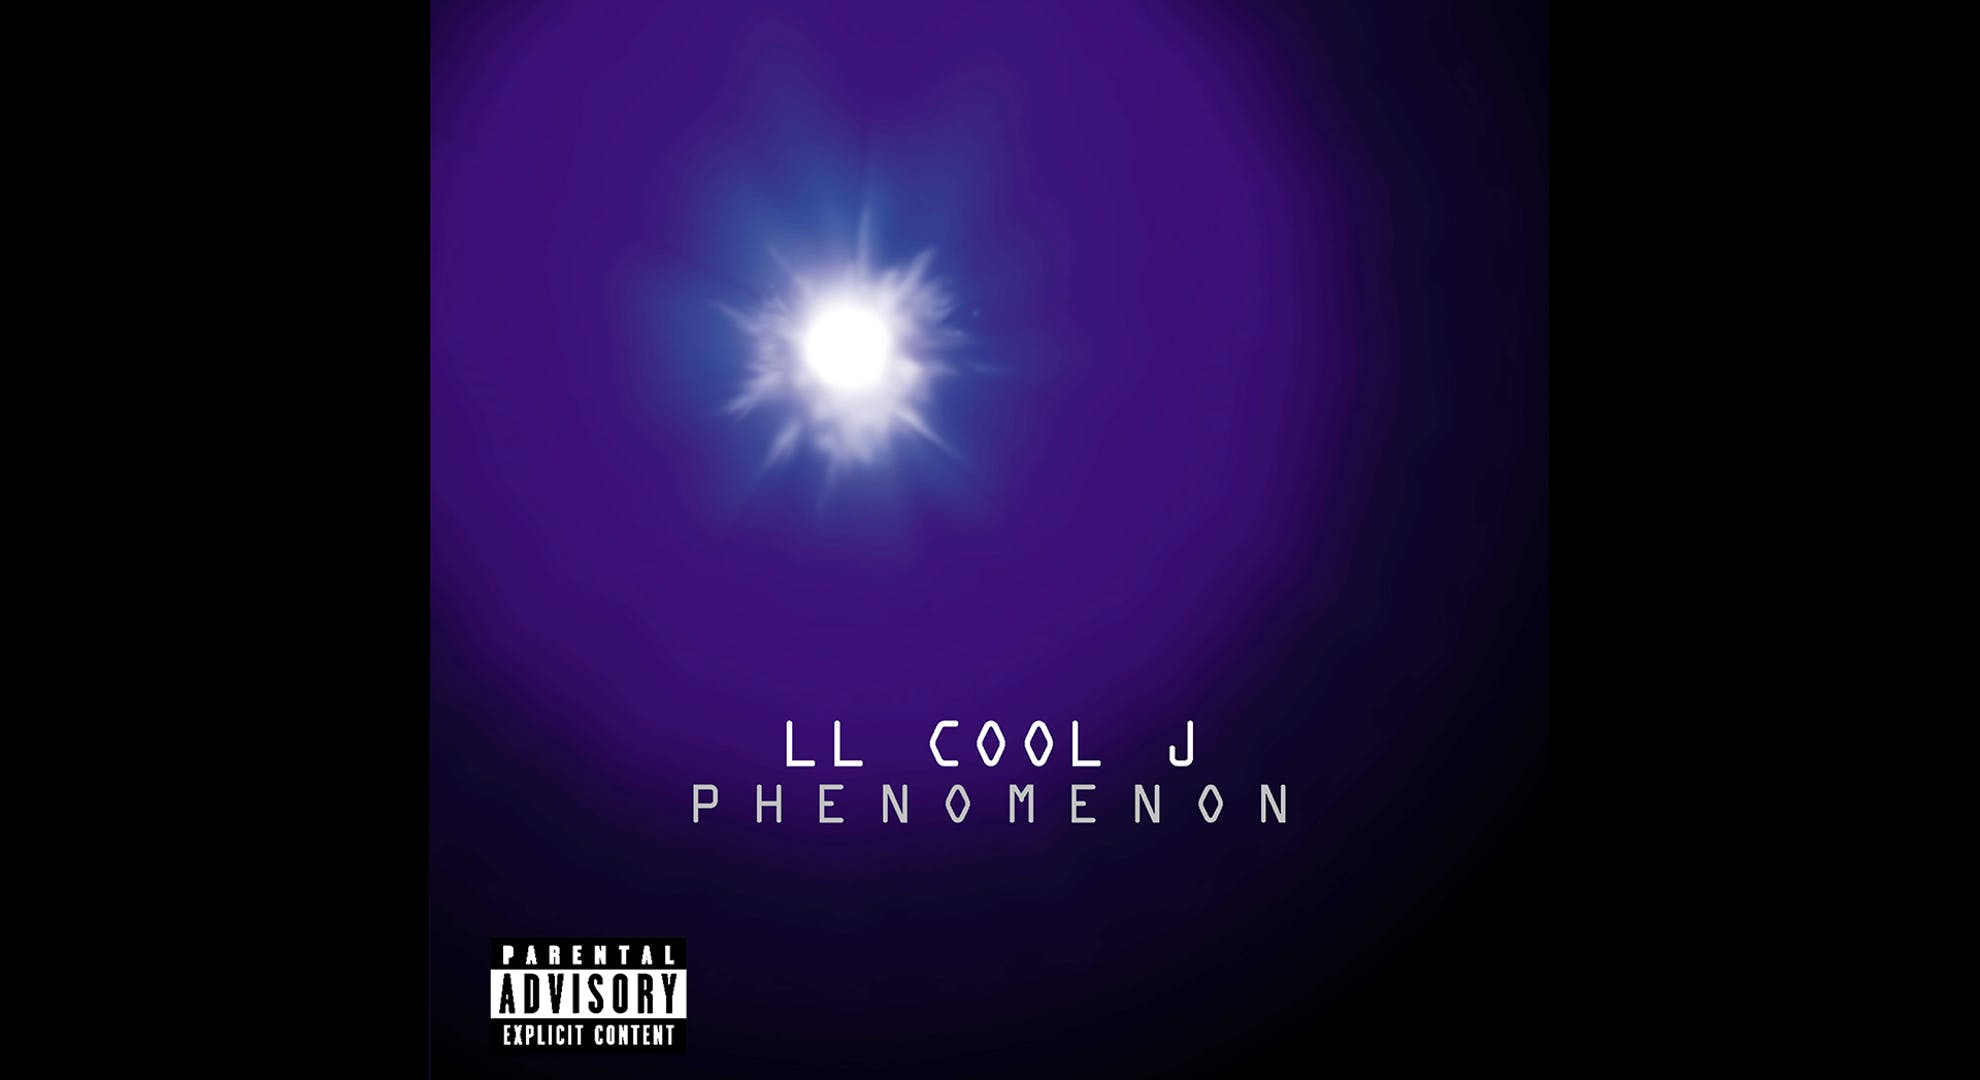 LL COOL J Cover - Phenomenon